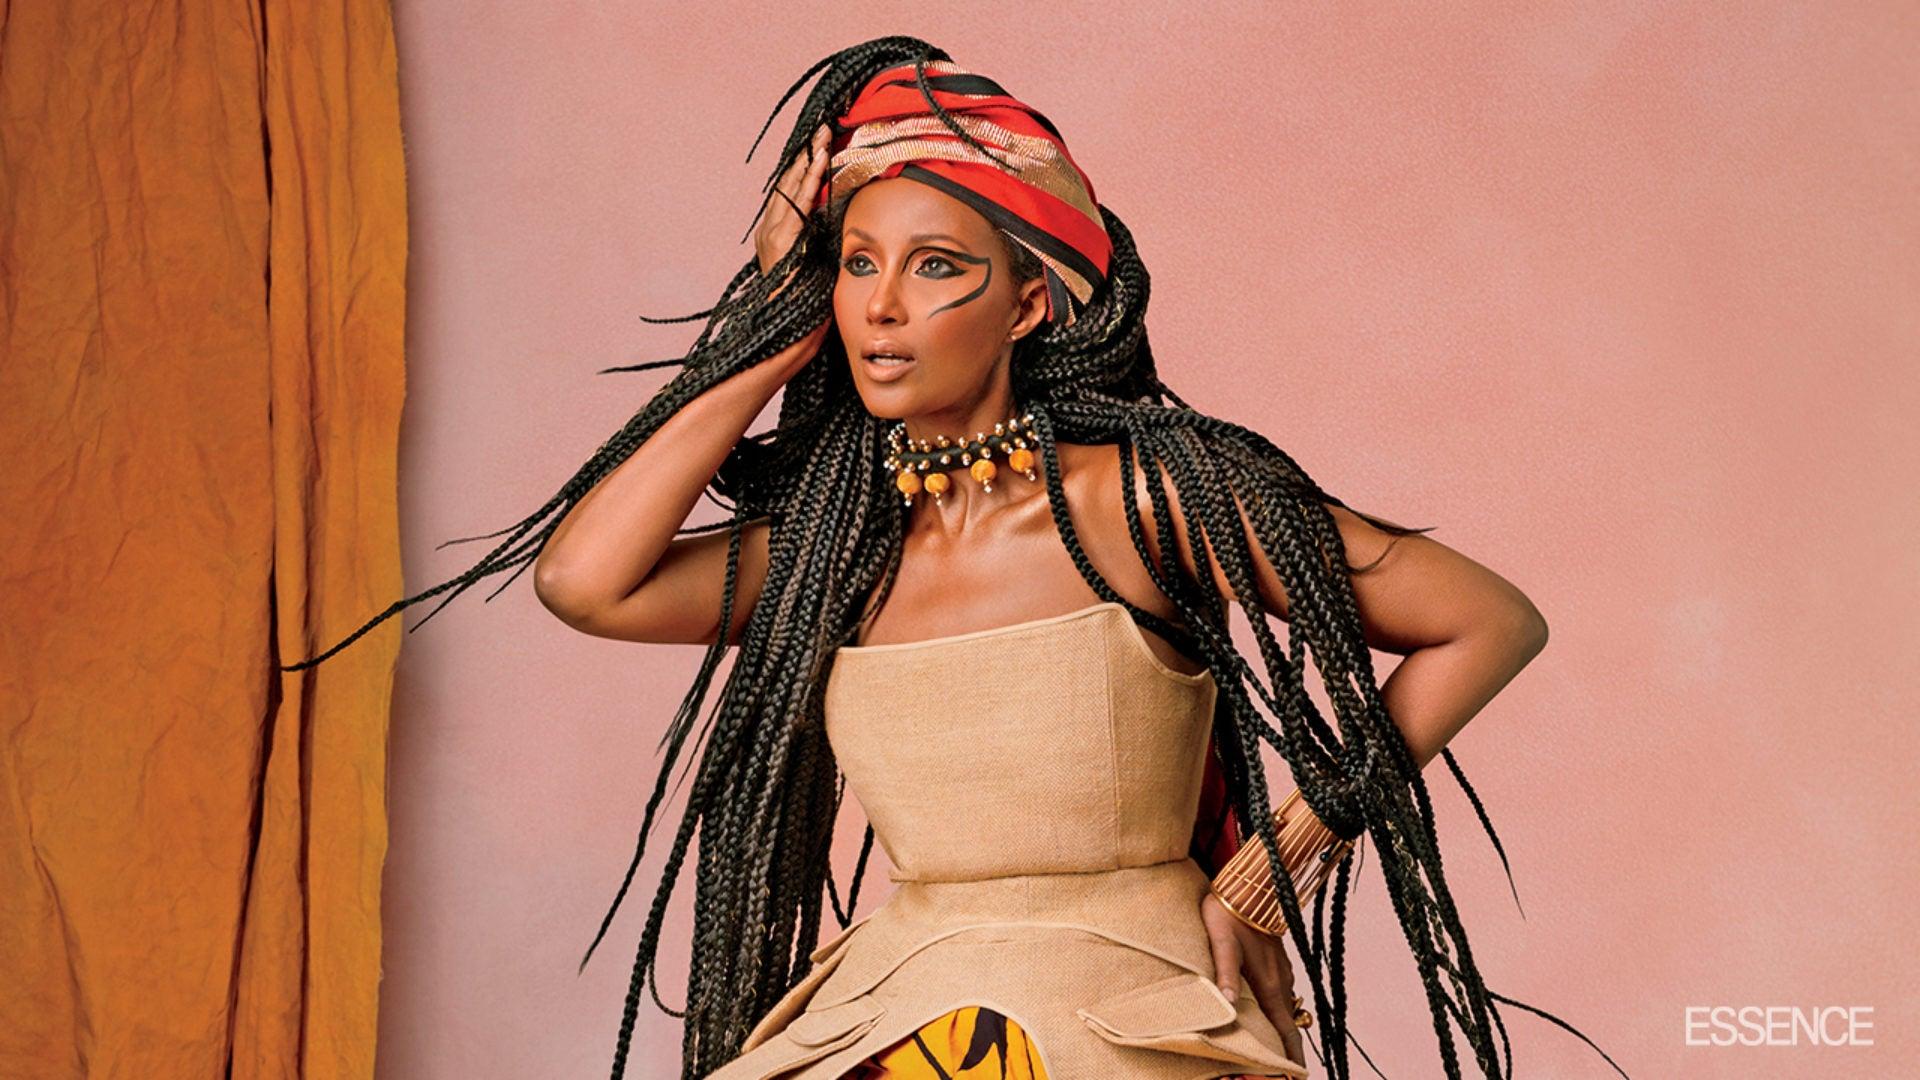 b20a1b22b6 Black Women's Lifestyle Guide, Black Love & Beauty Trends - Essence